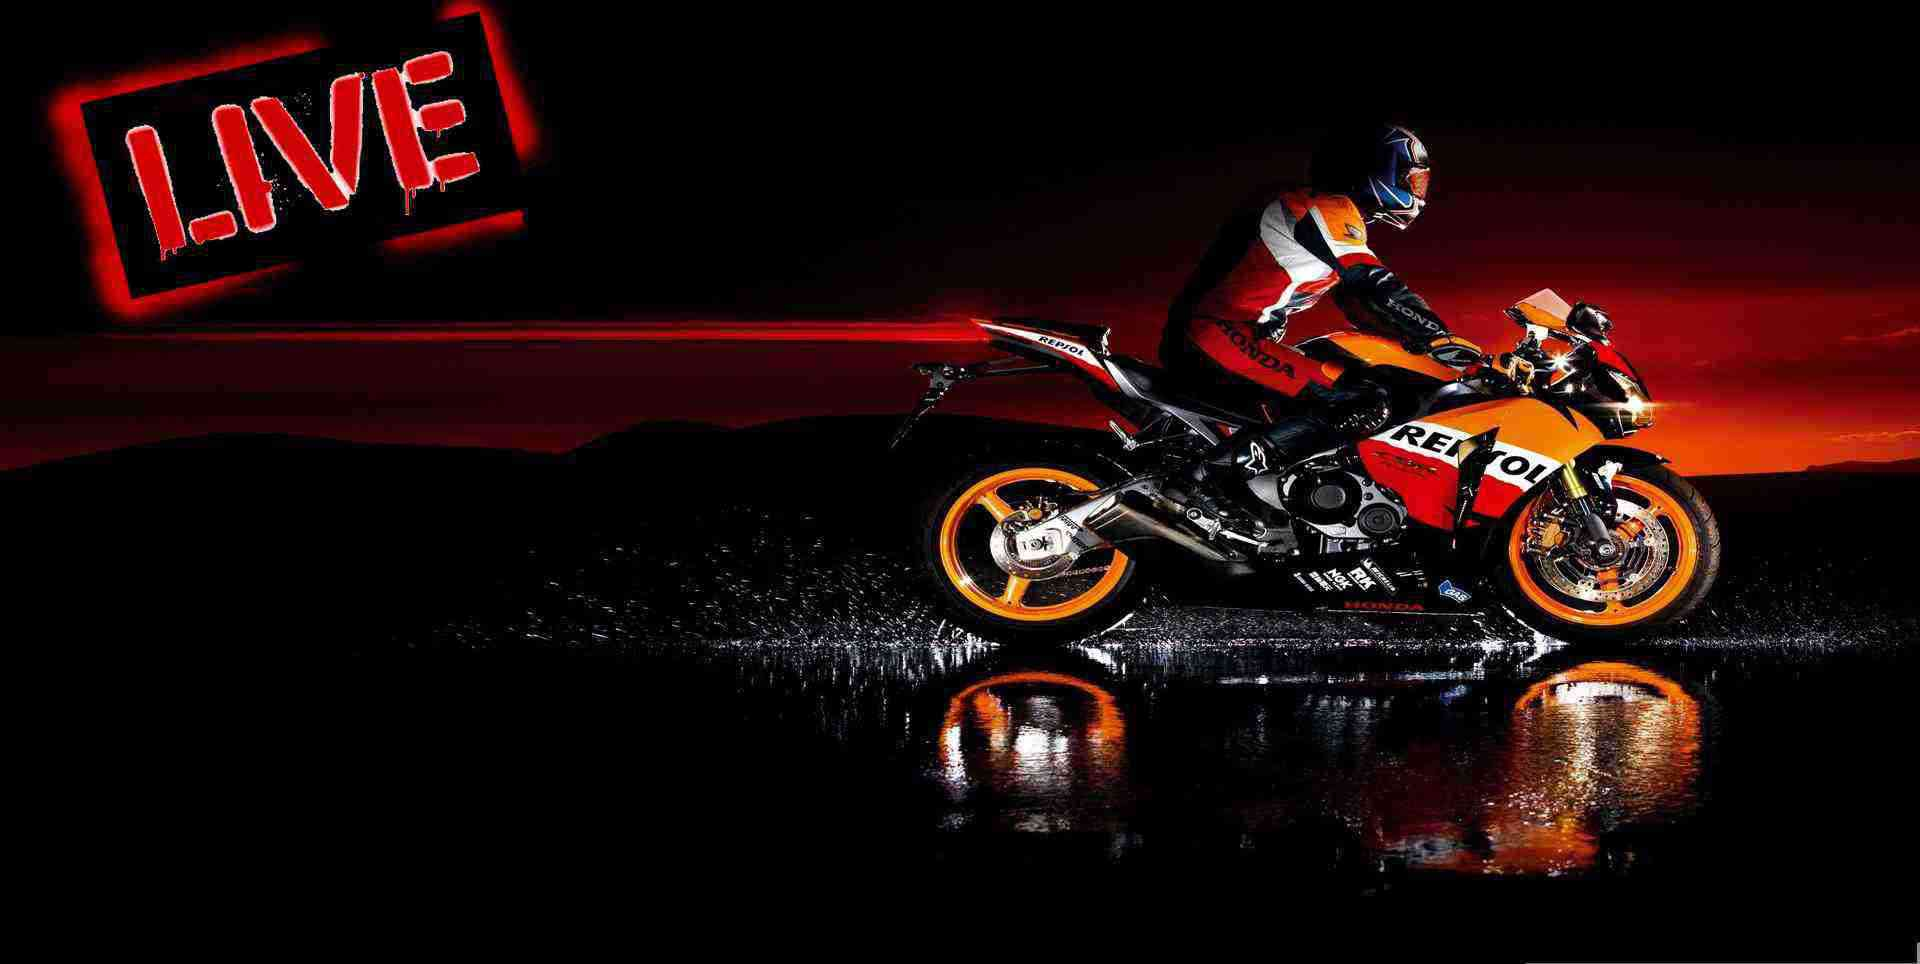 Watch Generali Grand Prix of Valencia Online